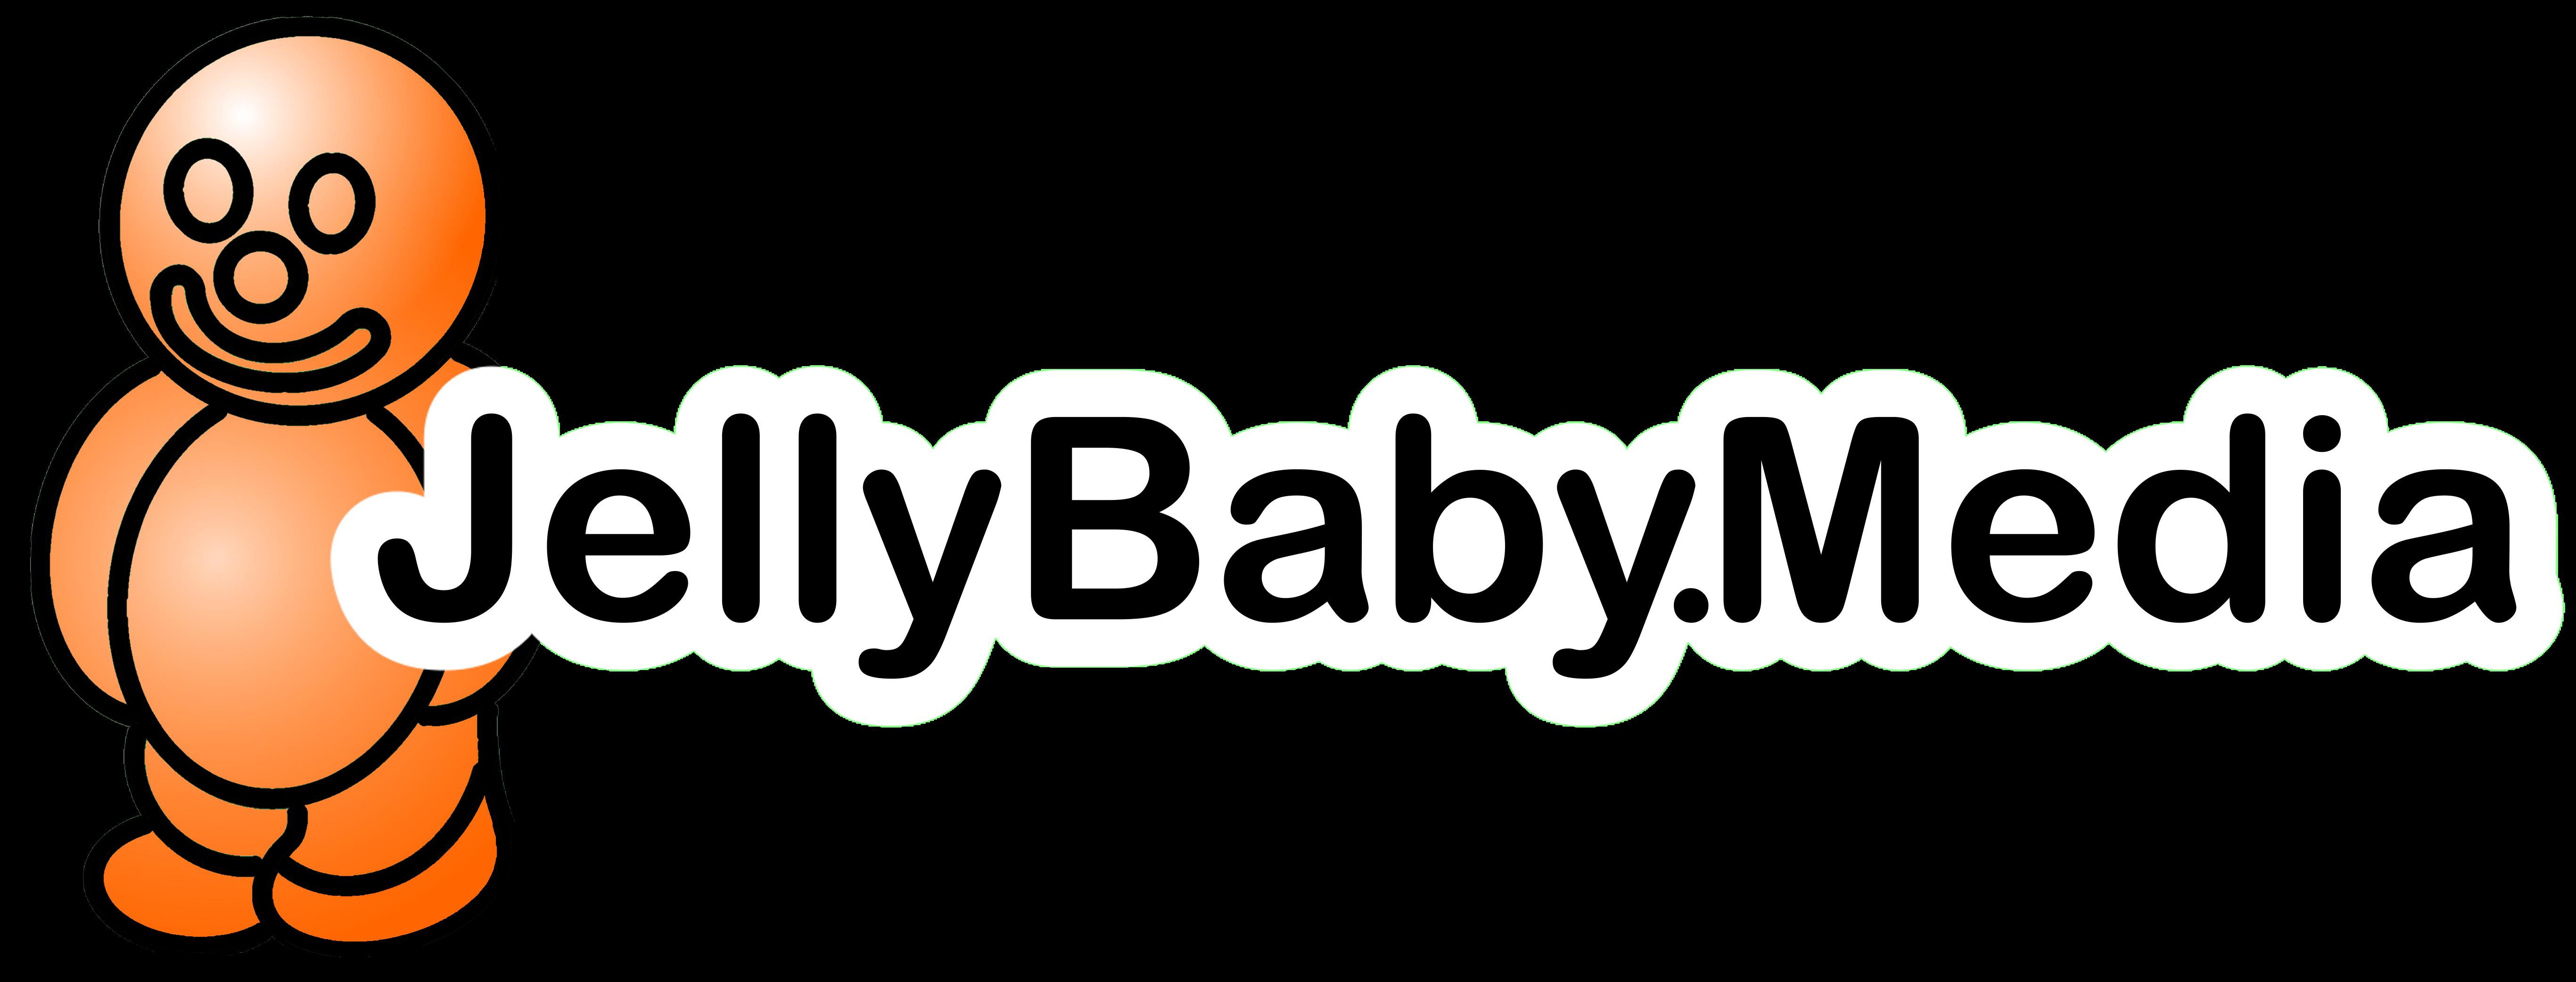 JellyBaby.Media